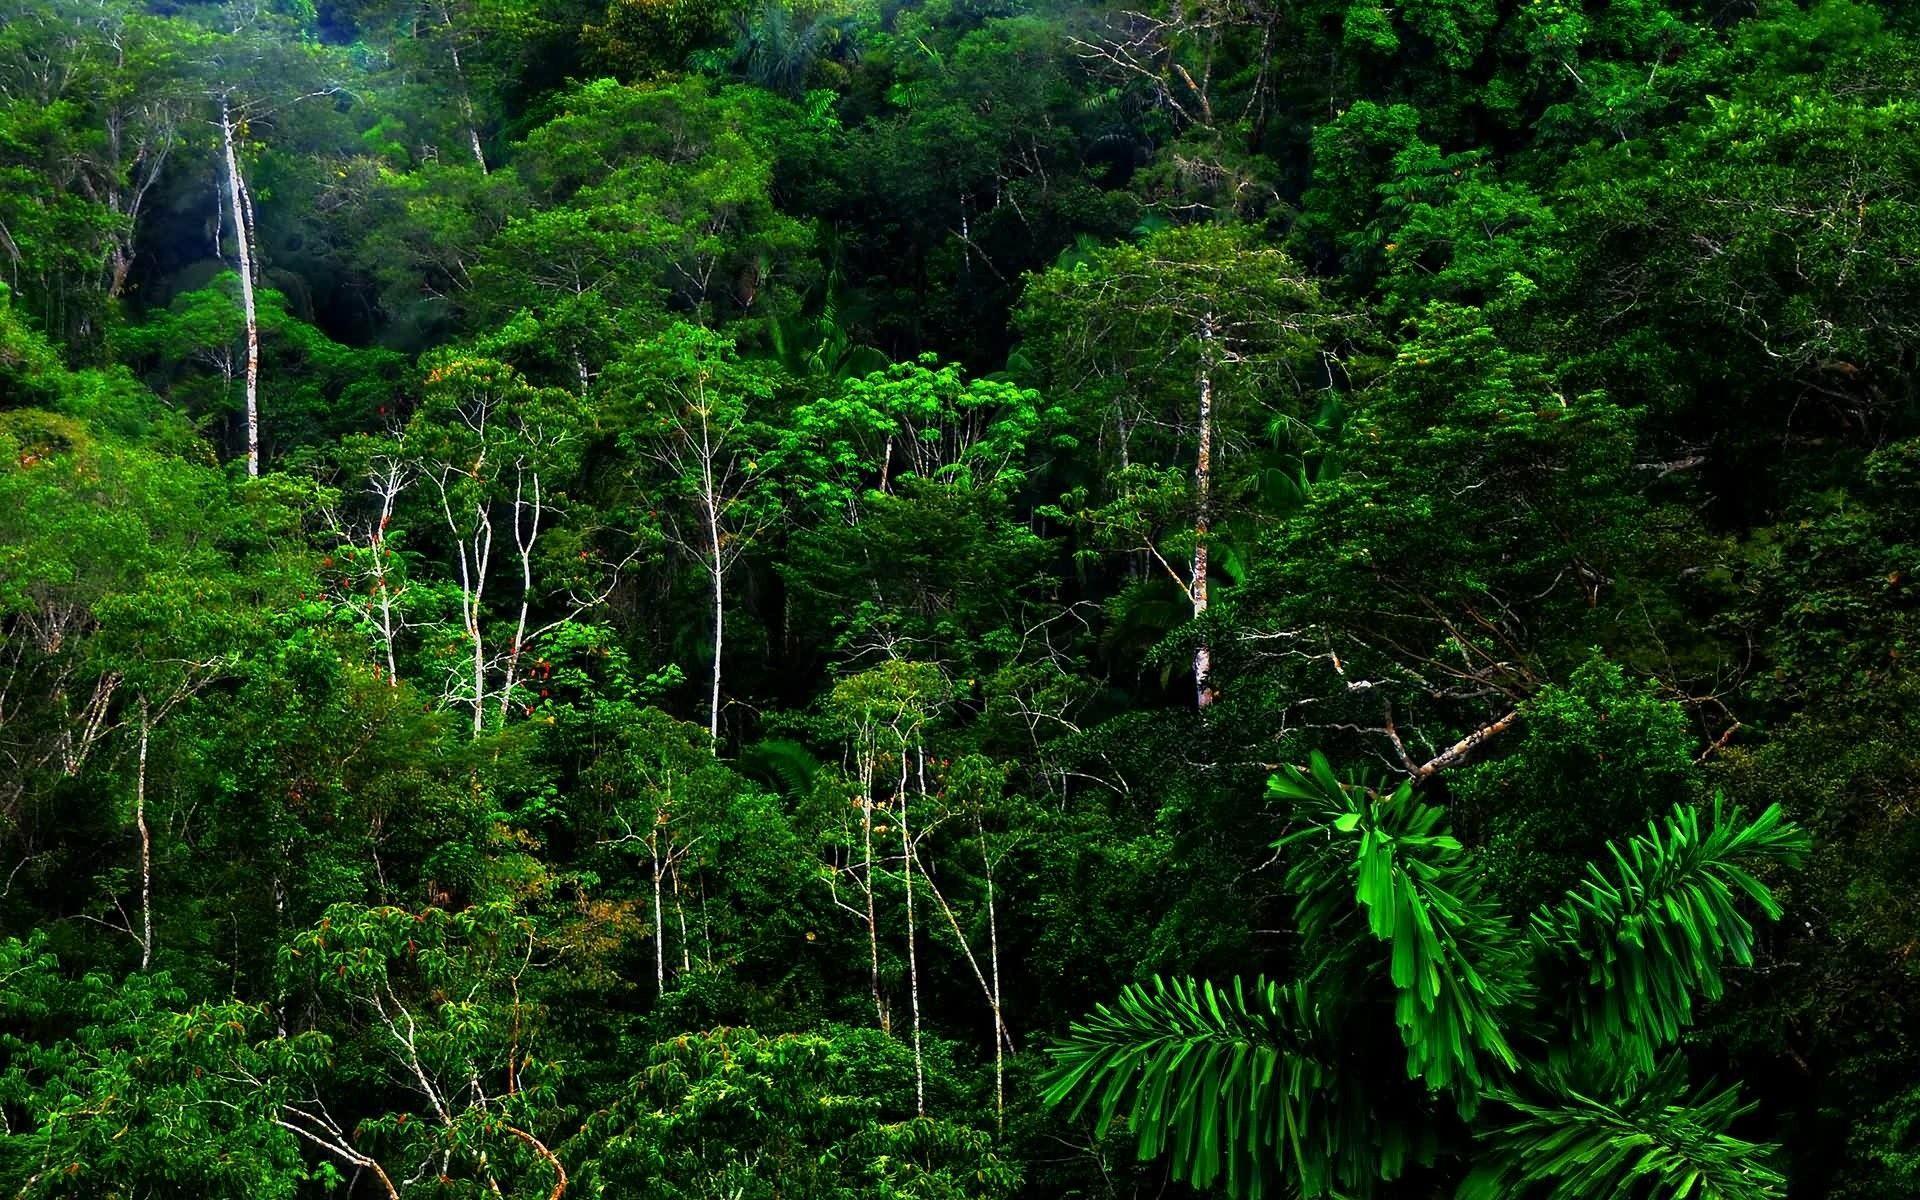 Rainforest Wallpapers Top Free Rainforest Backgrounds